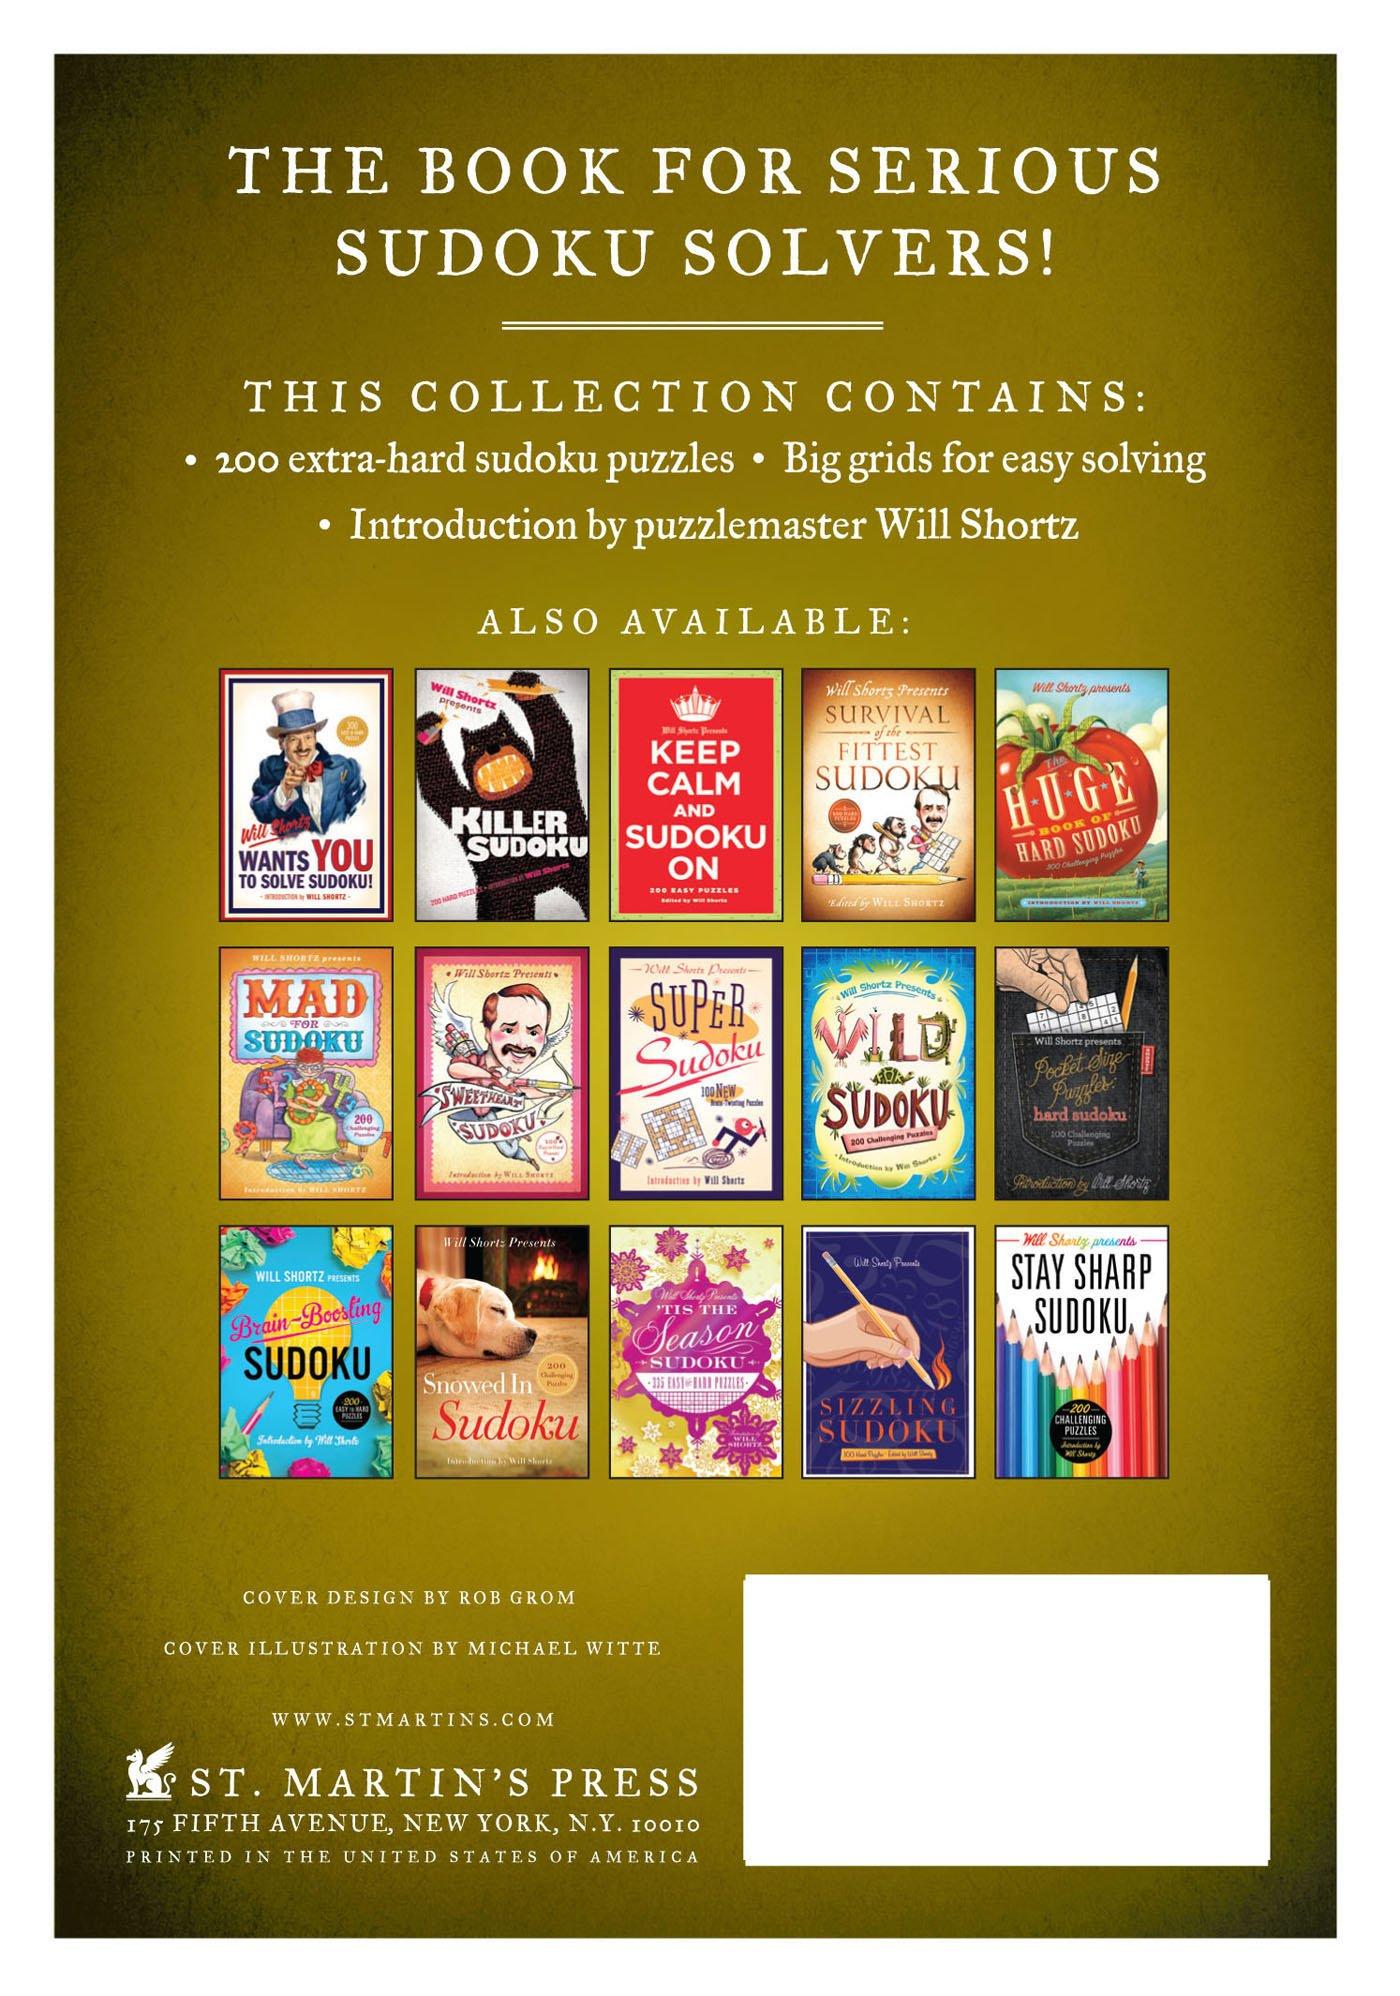 Will Shortz Presents Serious Sudoku: 200 Hard Puzzles: Will Shortz:  9781250055989: Amazon.com: Books